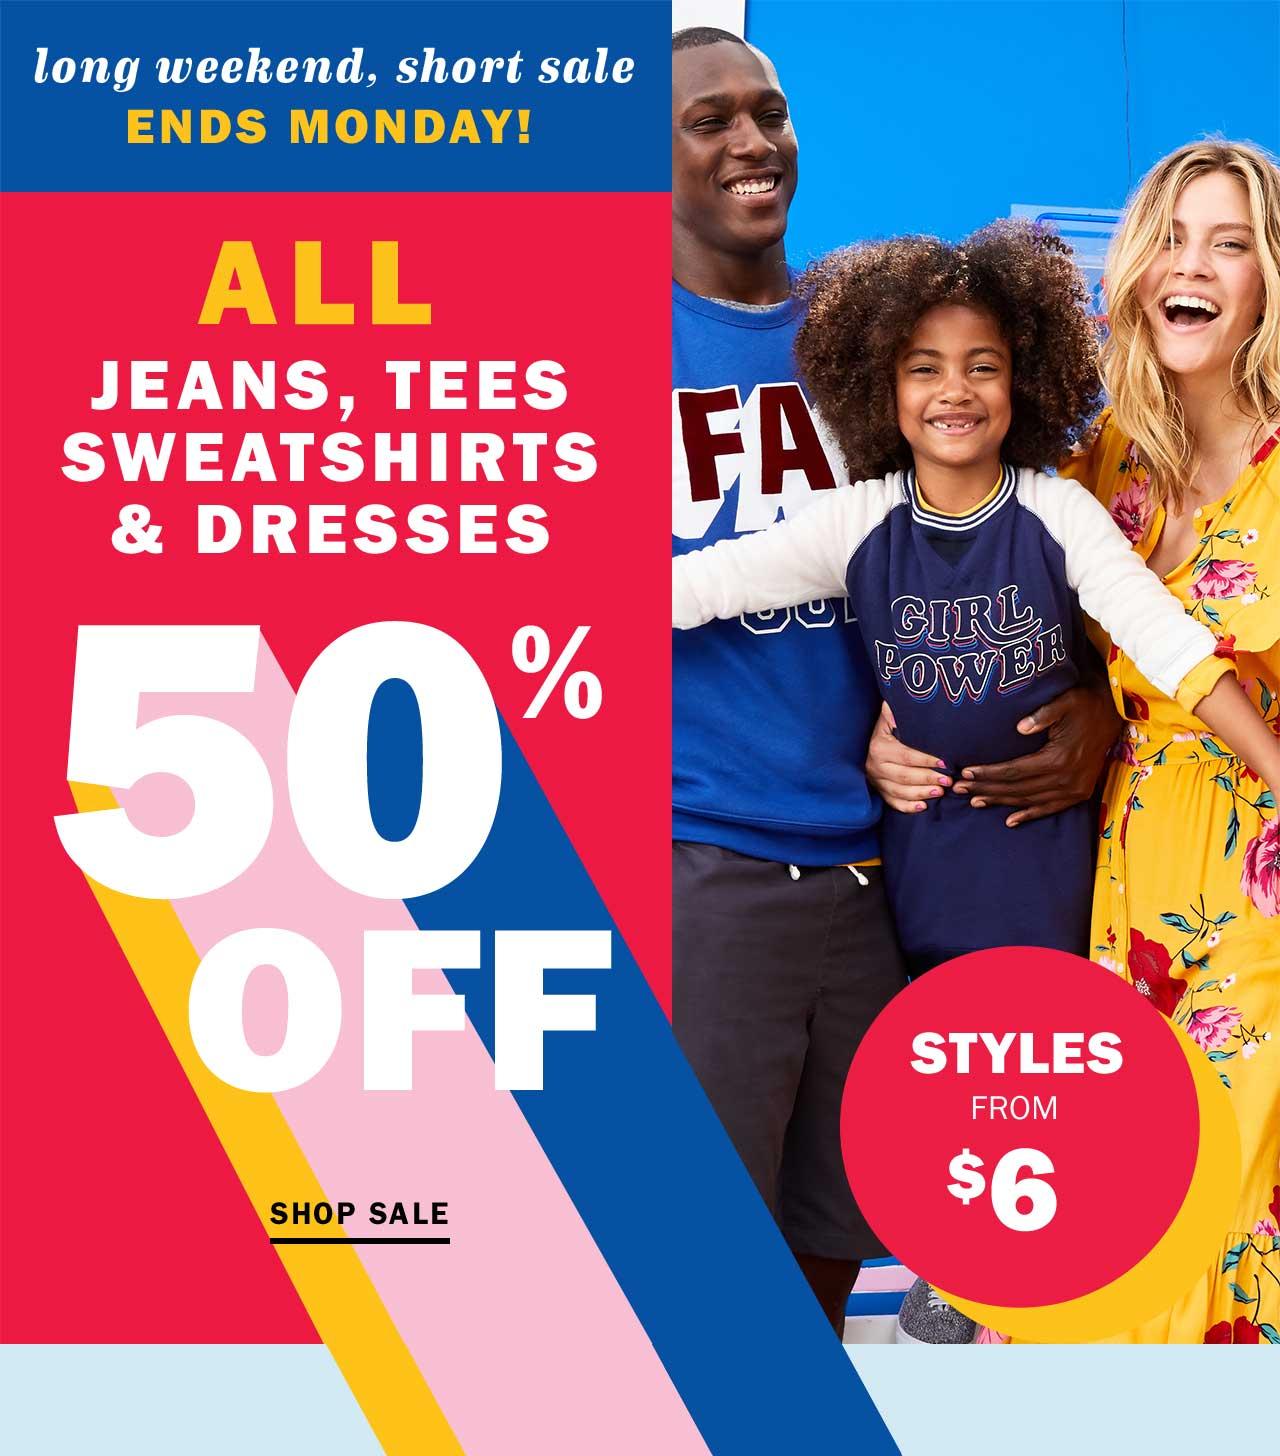 long weekend, short sale ENDS MONDAY!   ALL JEANS, TEES SWEATSHIRTS & DRESSES 50% OFF   SHOP SALE